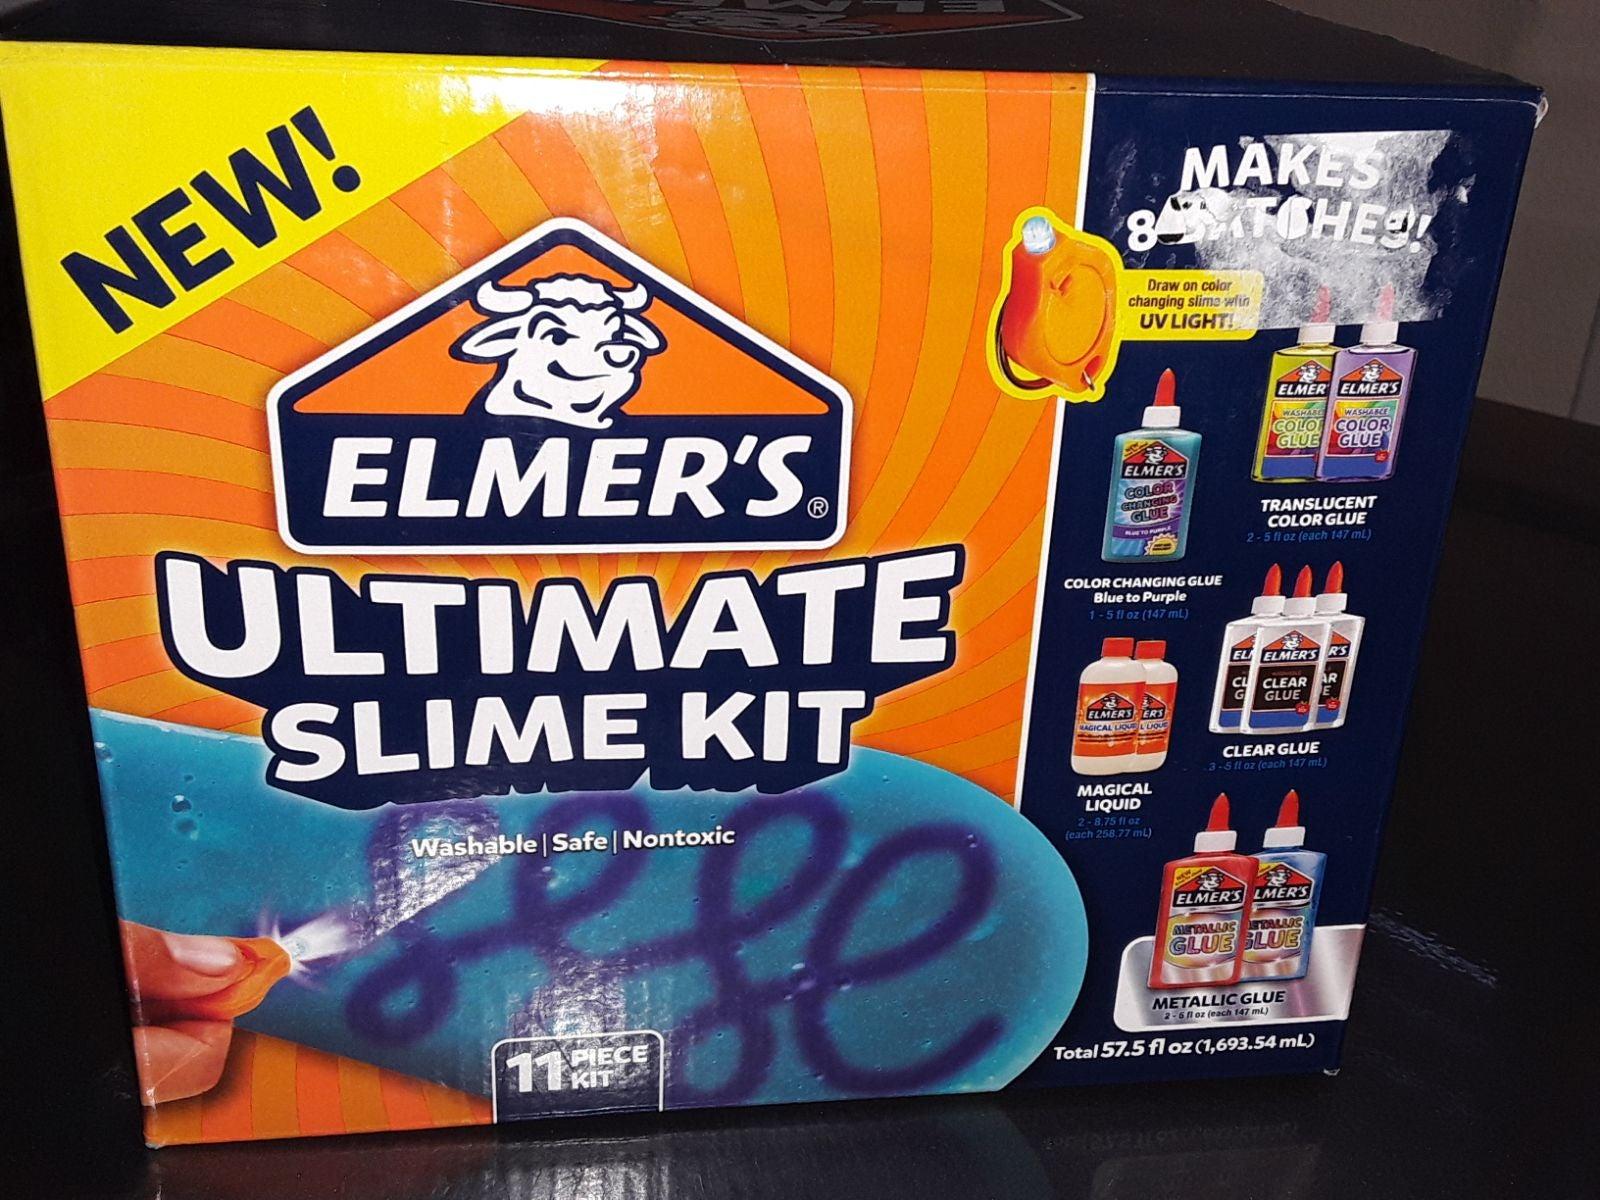 Elmer's 11ct Ultimate Slime Kit draw on